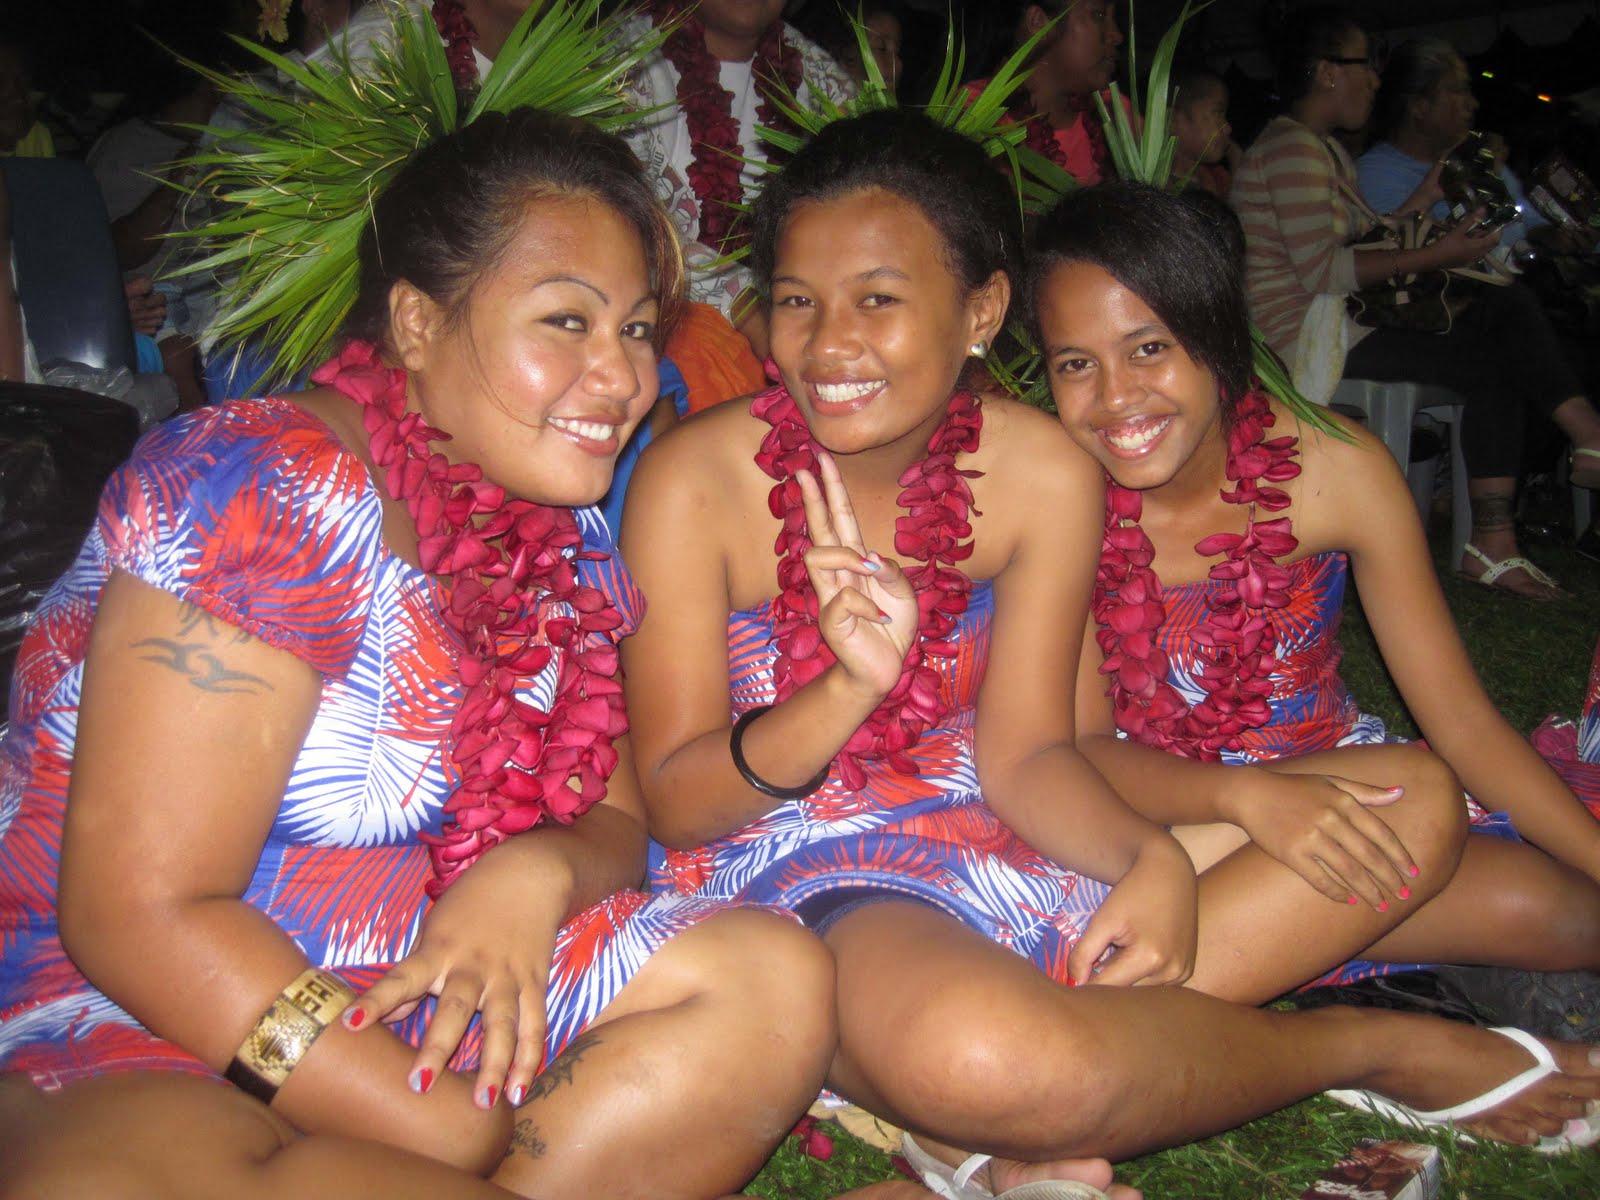 pics young sexy samoan girls